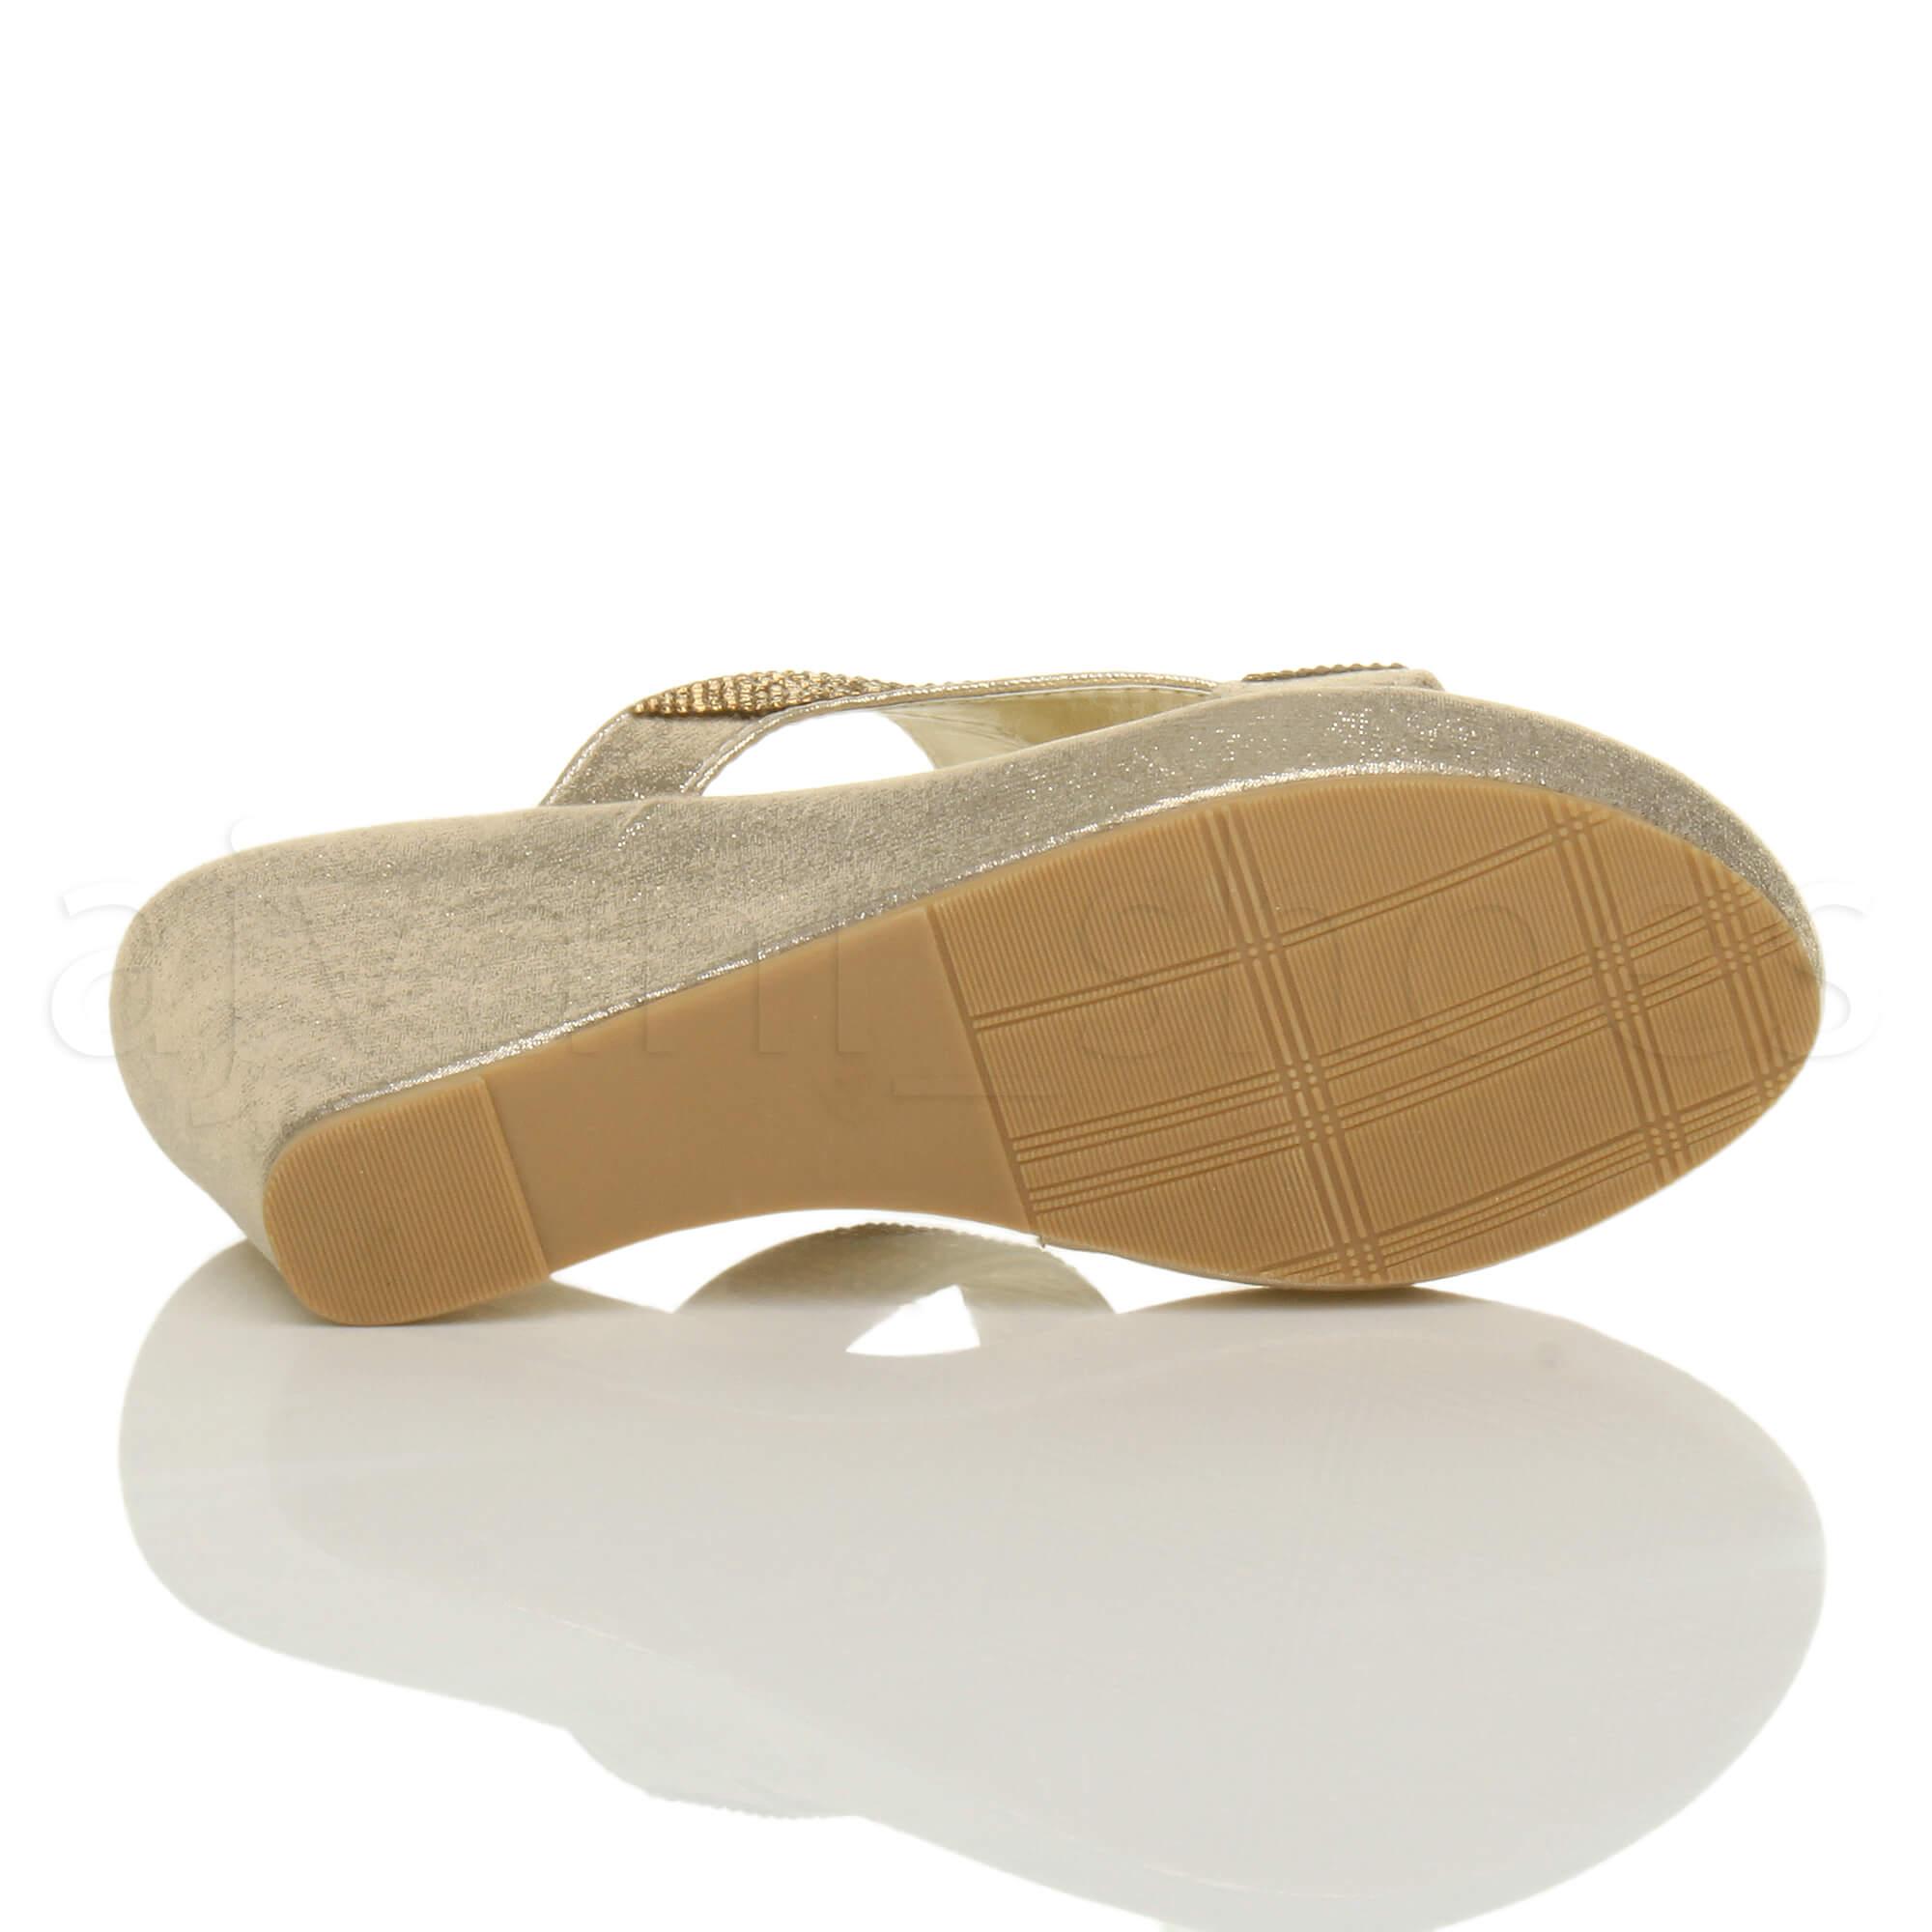 femmes talon haut compens lani res strass soir f te mules sandales pointure ebay. Black Bedroom Furniture Sets. Home Design Ideas